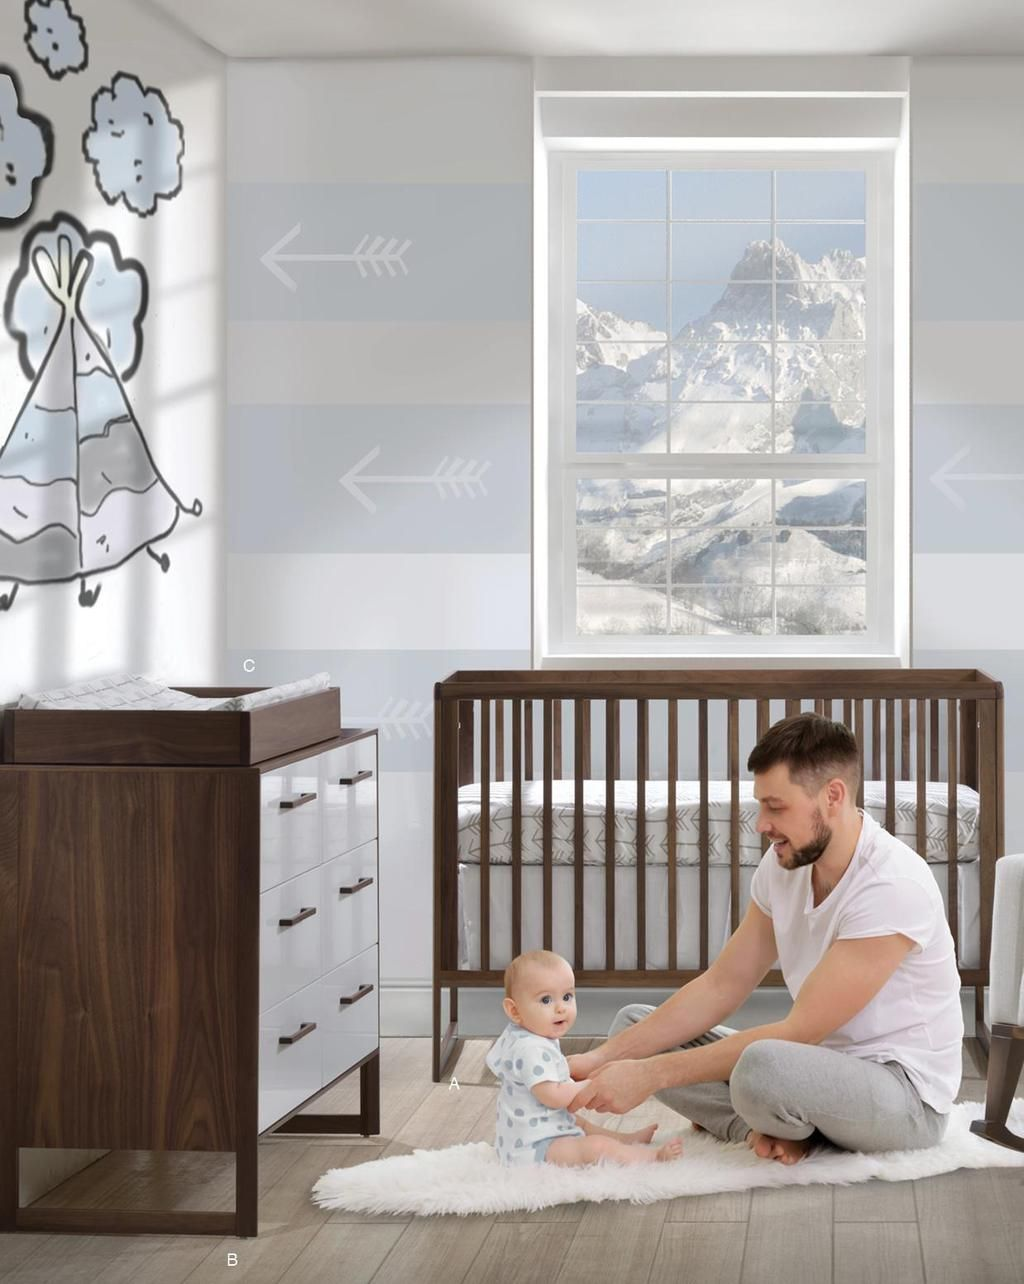 Natart Modern Design Rio Collection Baby furniture